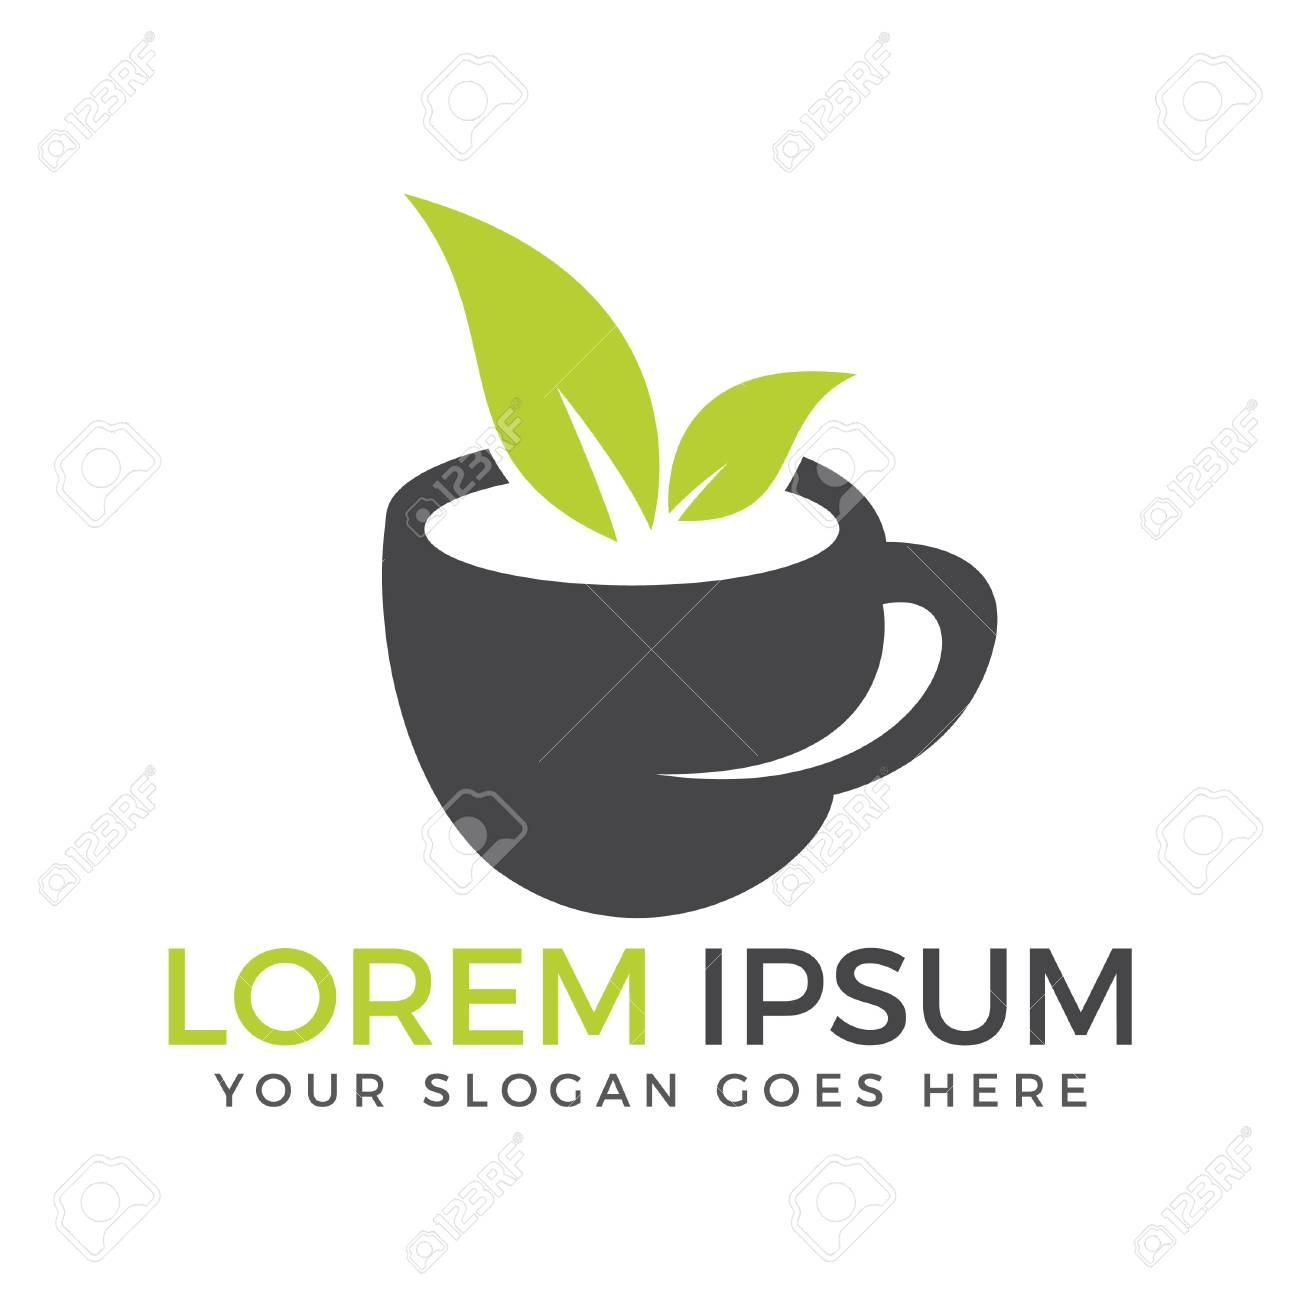 Green Tea Logo Company Green Tea Shop Logo Design Royalty Free Cliparts Vectors And Stock Illustration Image 93209294